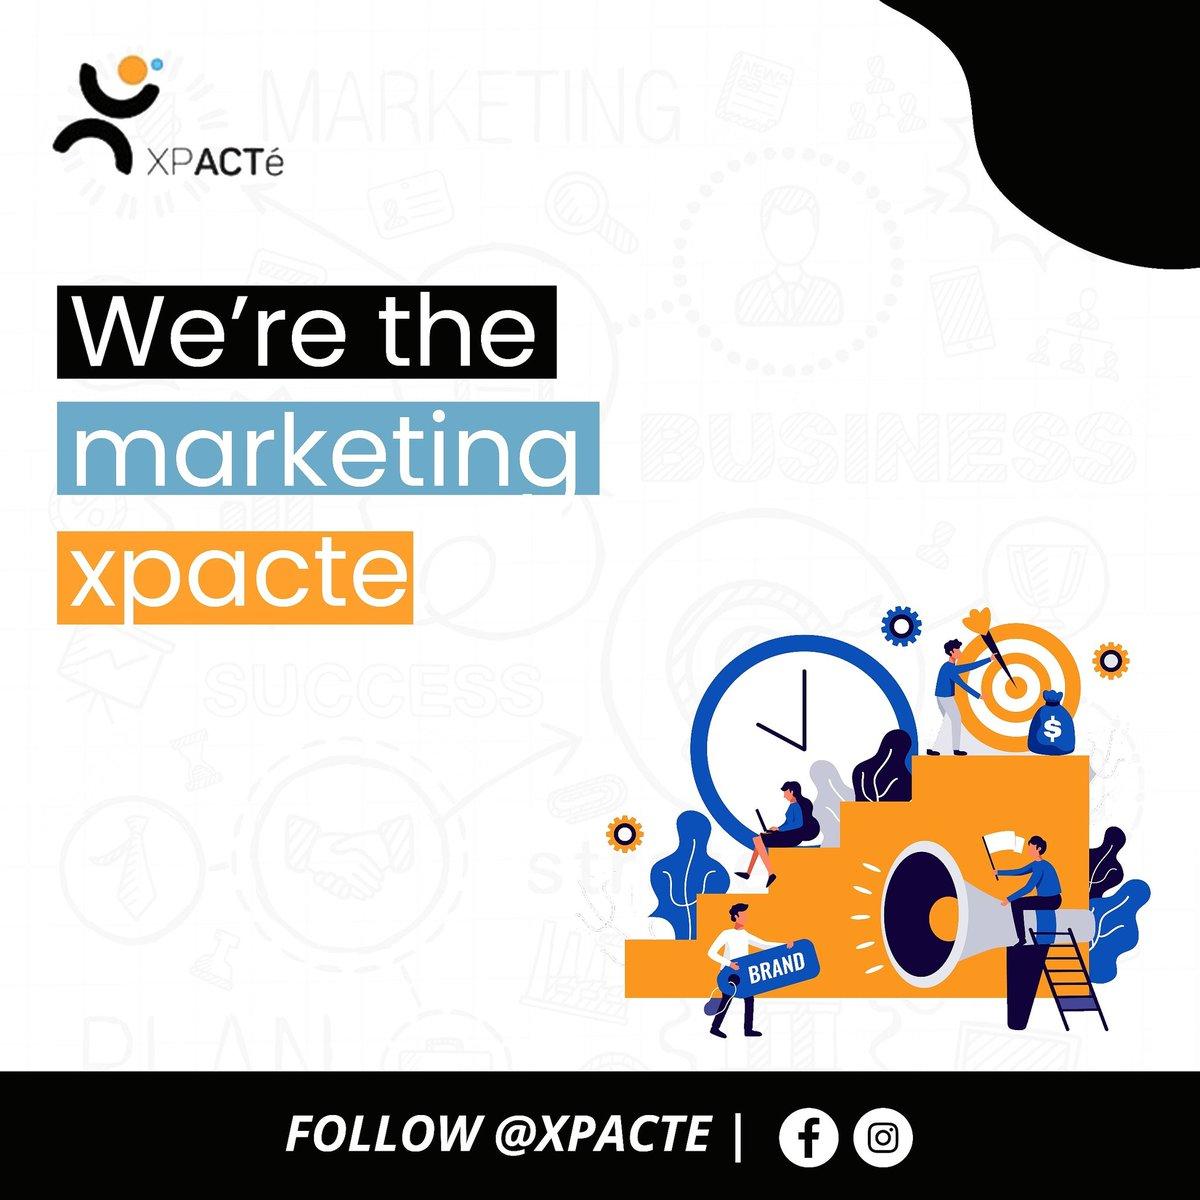 You will definitely need an xpacte to grow your brand.  Follow @xpacte  #thursdaymorning  #thursdayvibes #branding #xpacte